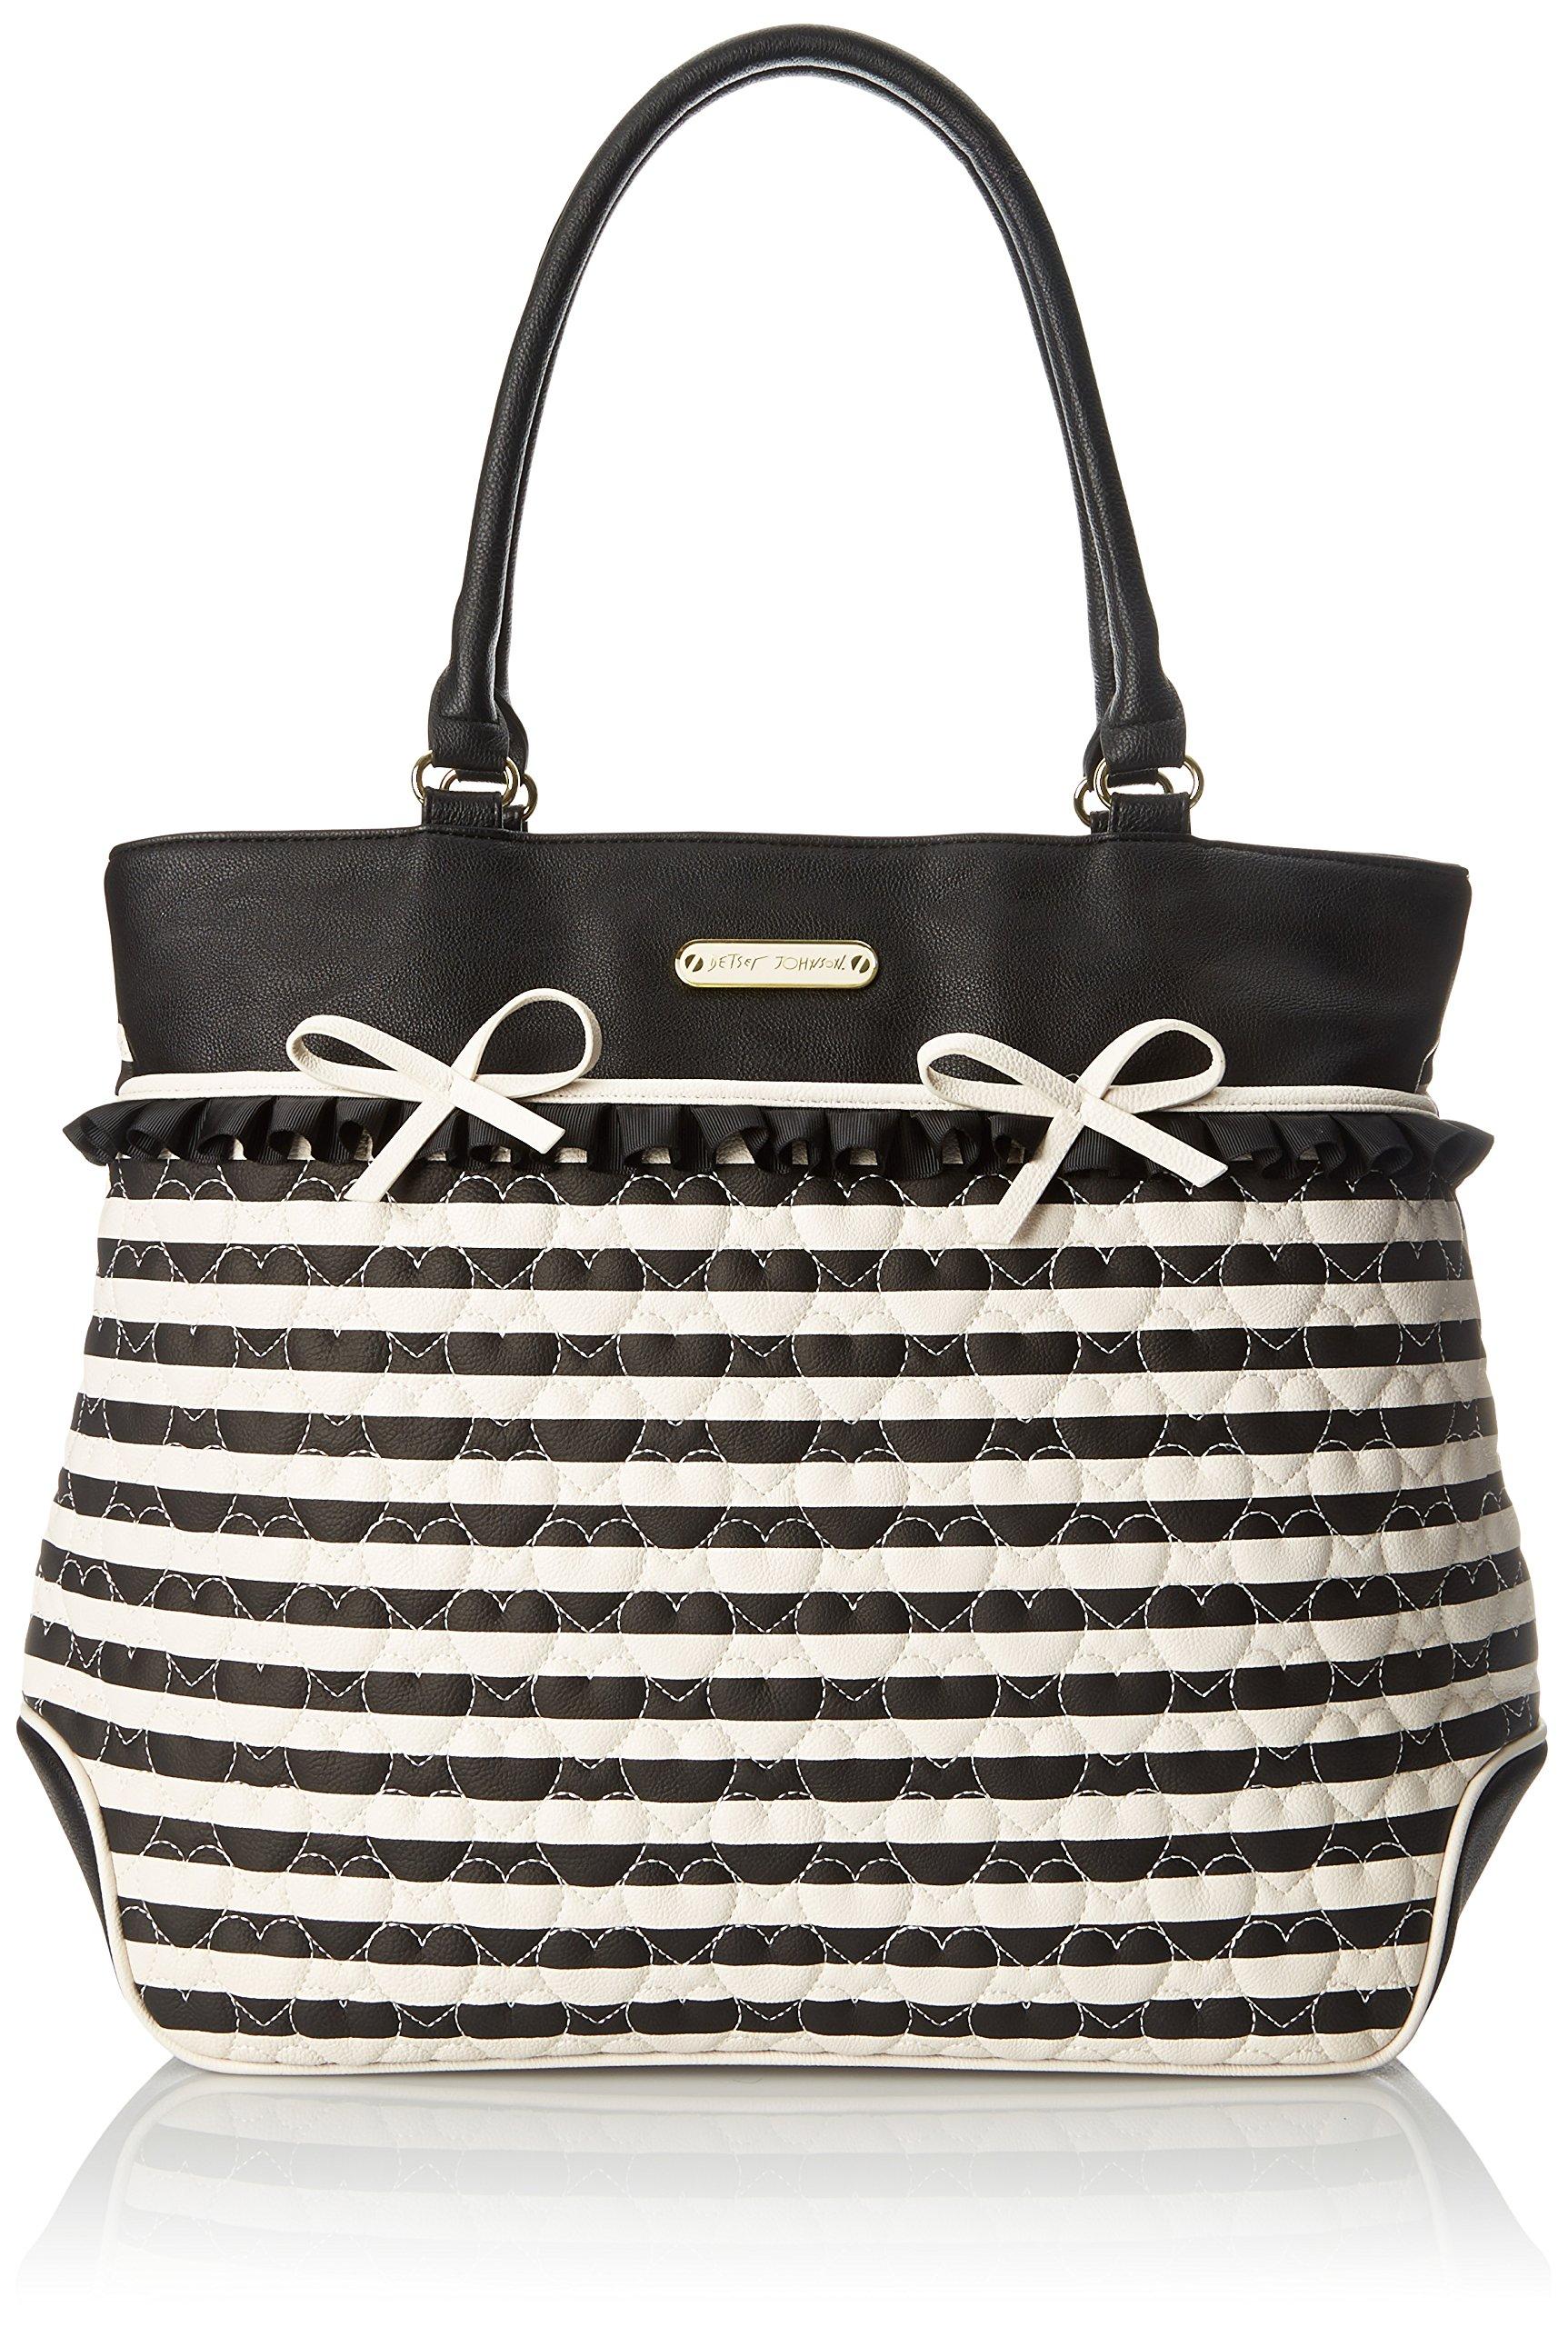 Betsey Johnson Moms The Word Tote Shoulder Bag, Black, One Size